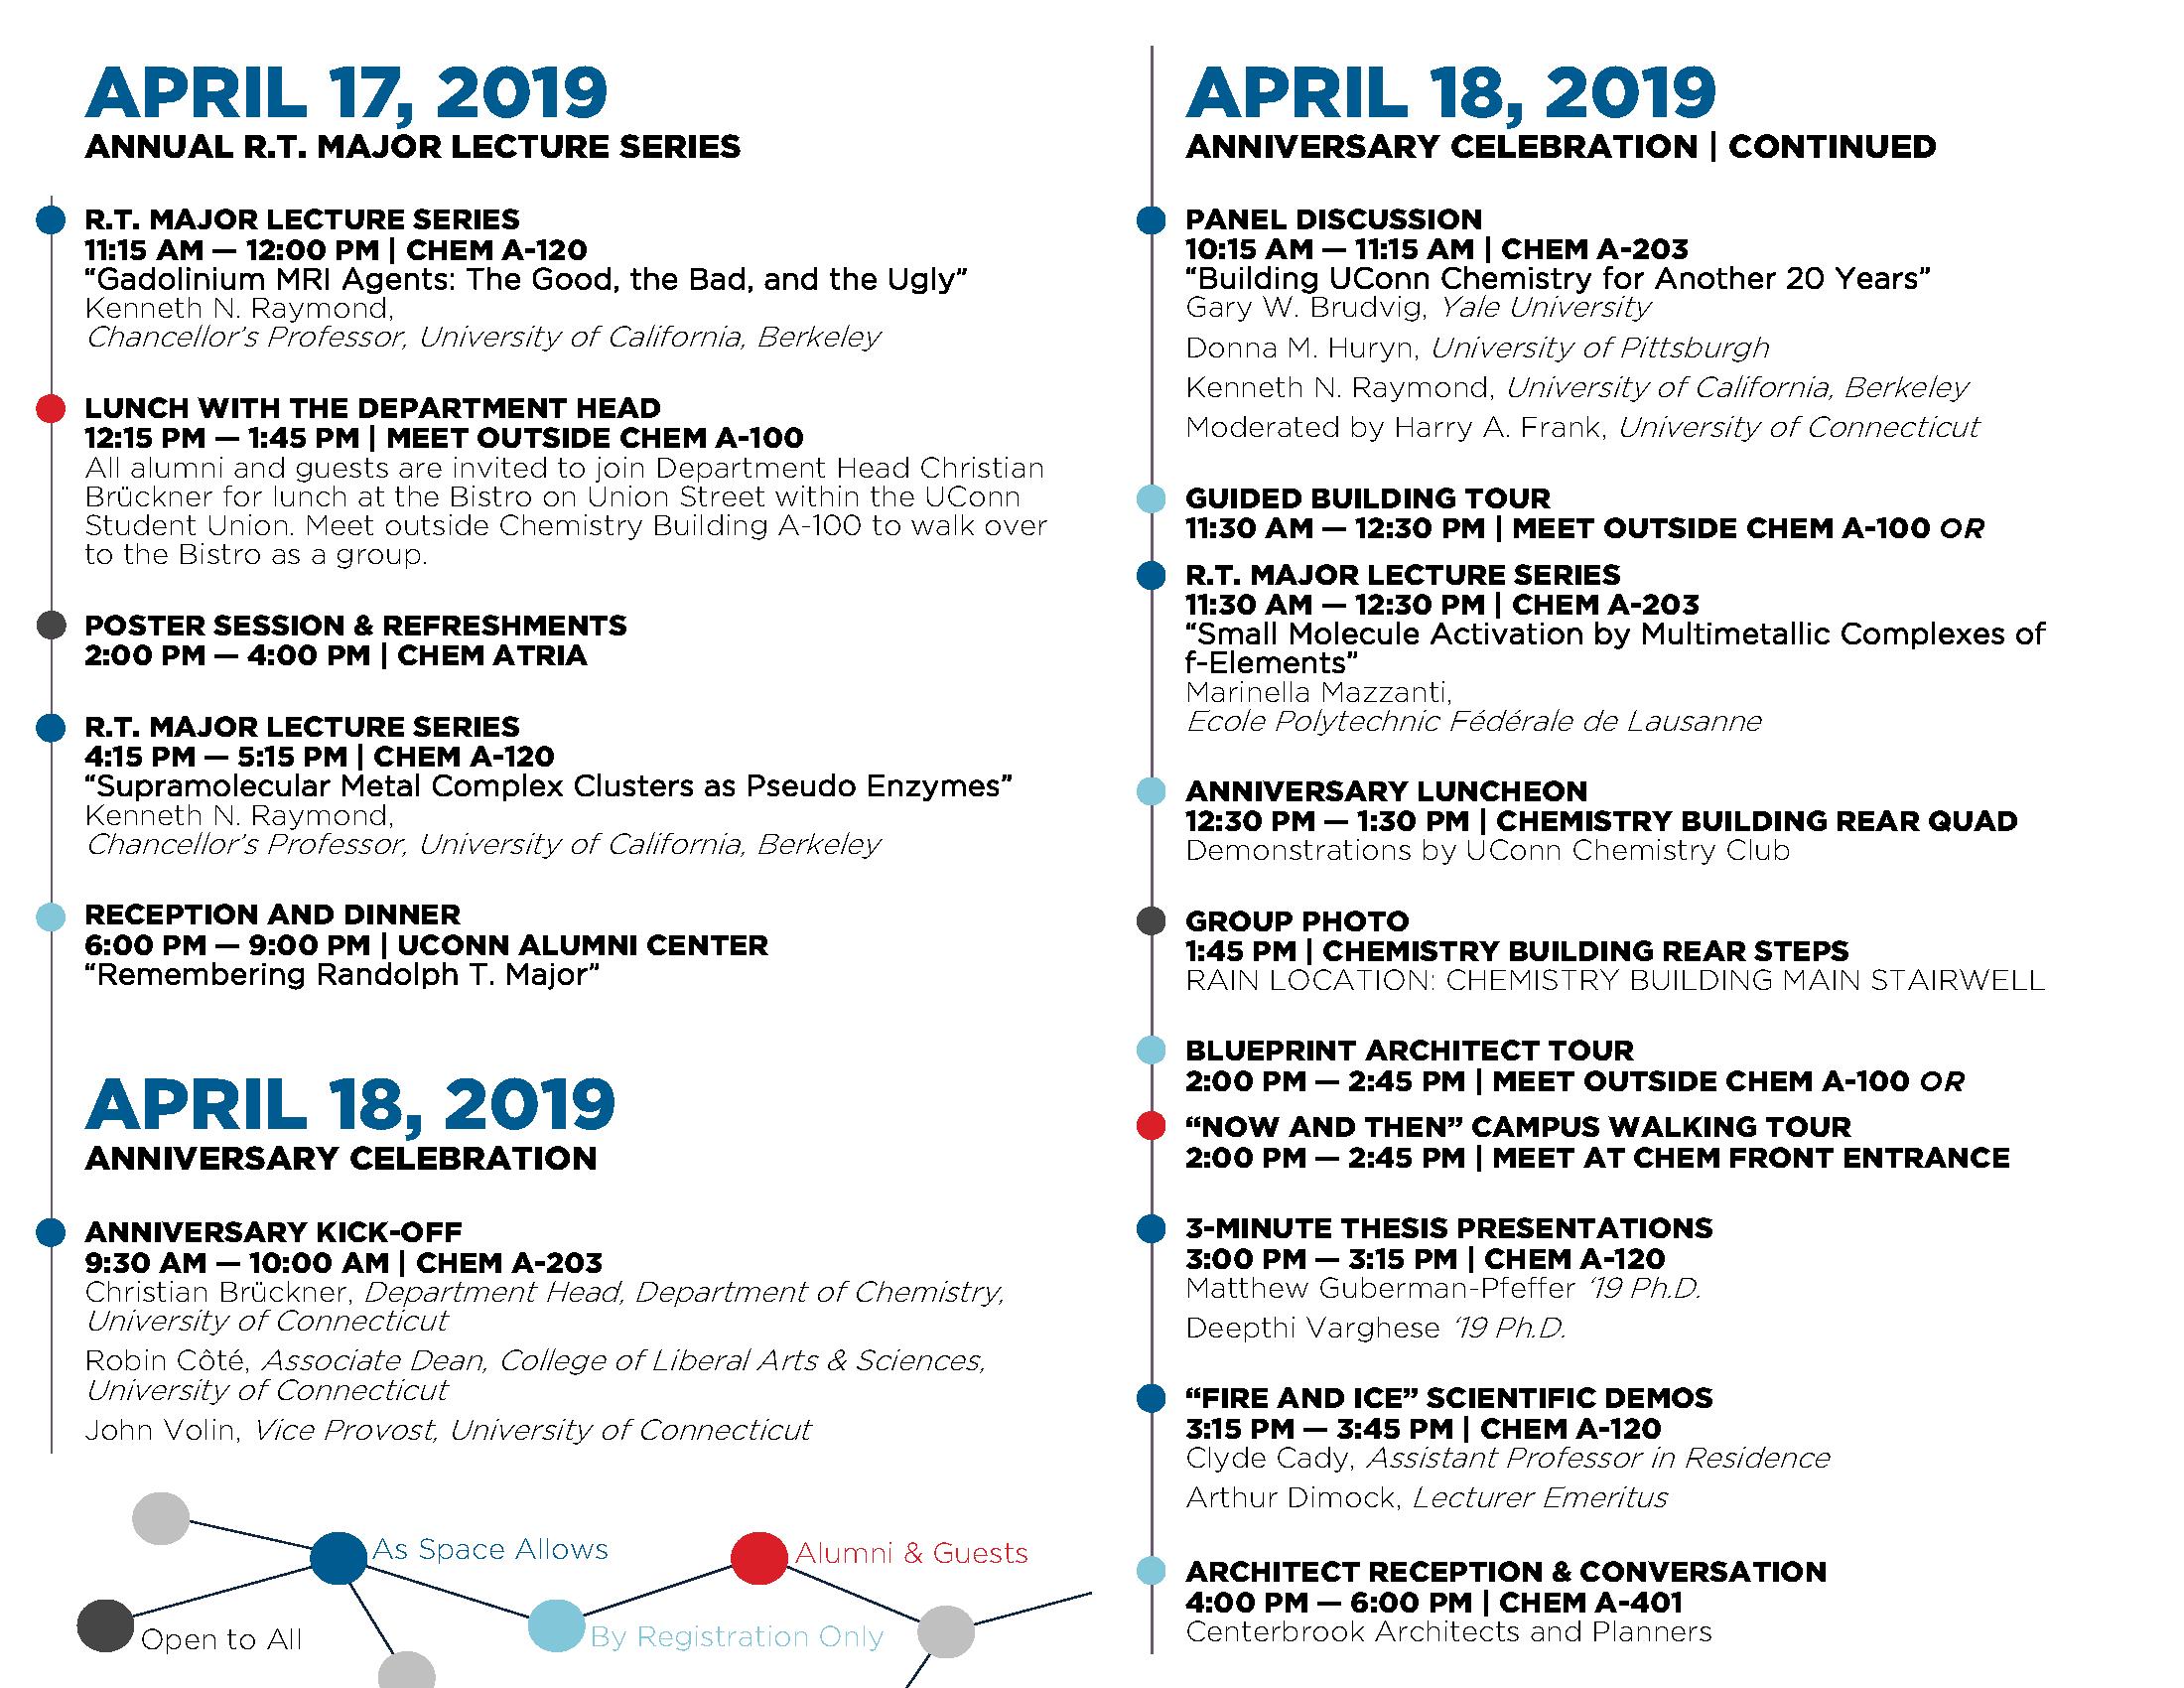 2019 Anniversary & R.T. Major Schedule